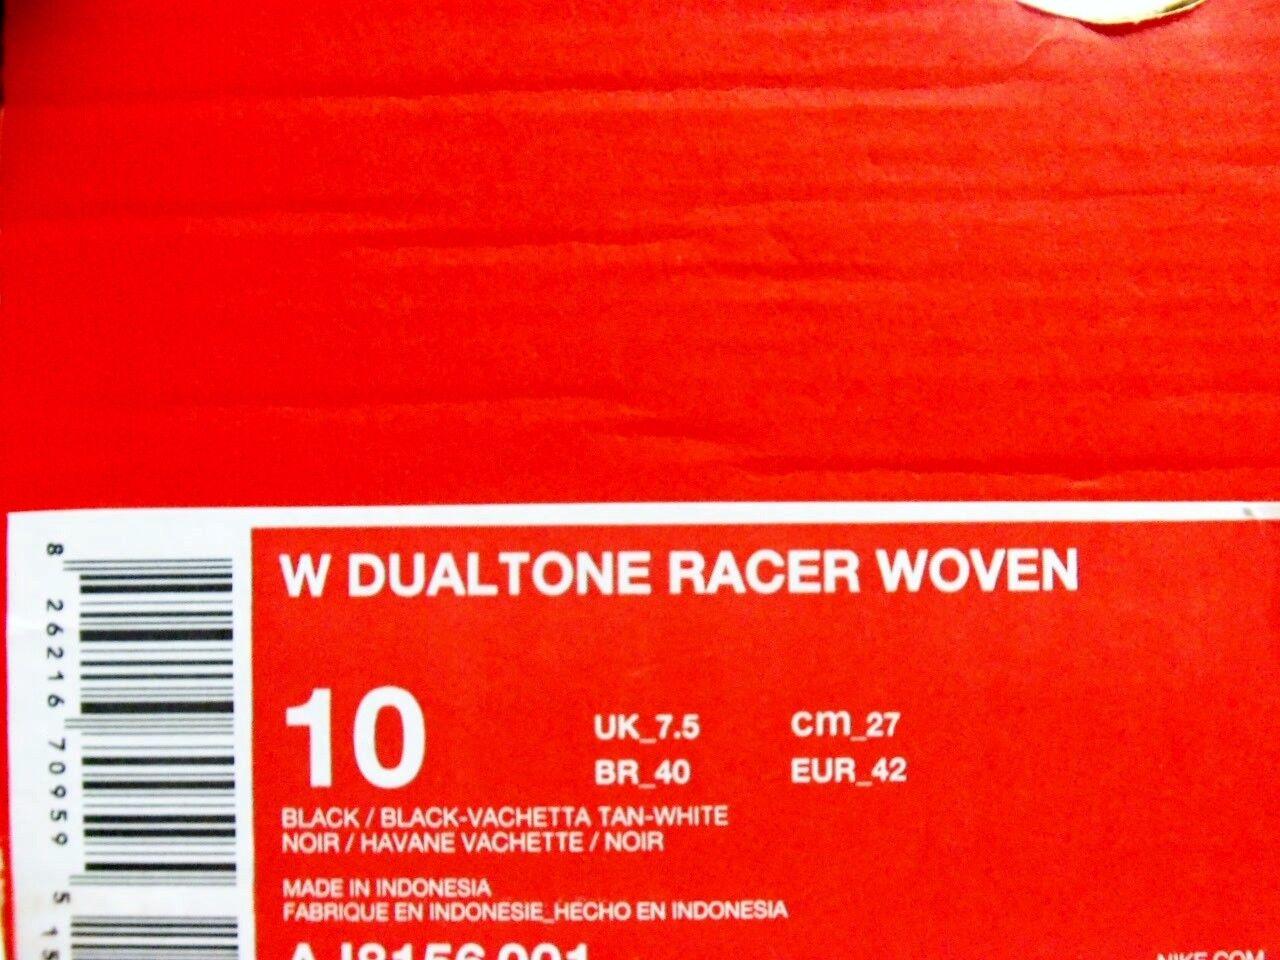 NIKE DUALTONE RACER RACER RACER WOVEN BLACK VACHETTA TAN-WHITE SIZE WOMEN'S 10 1449c9